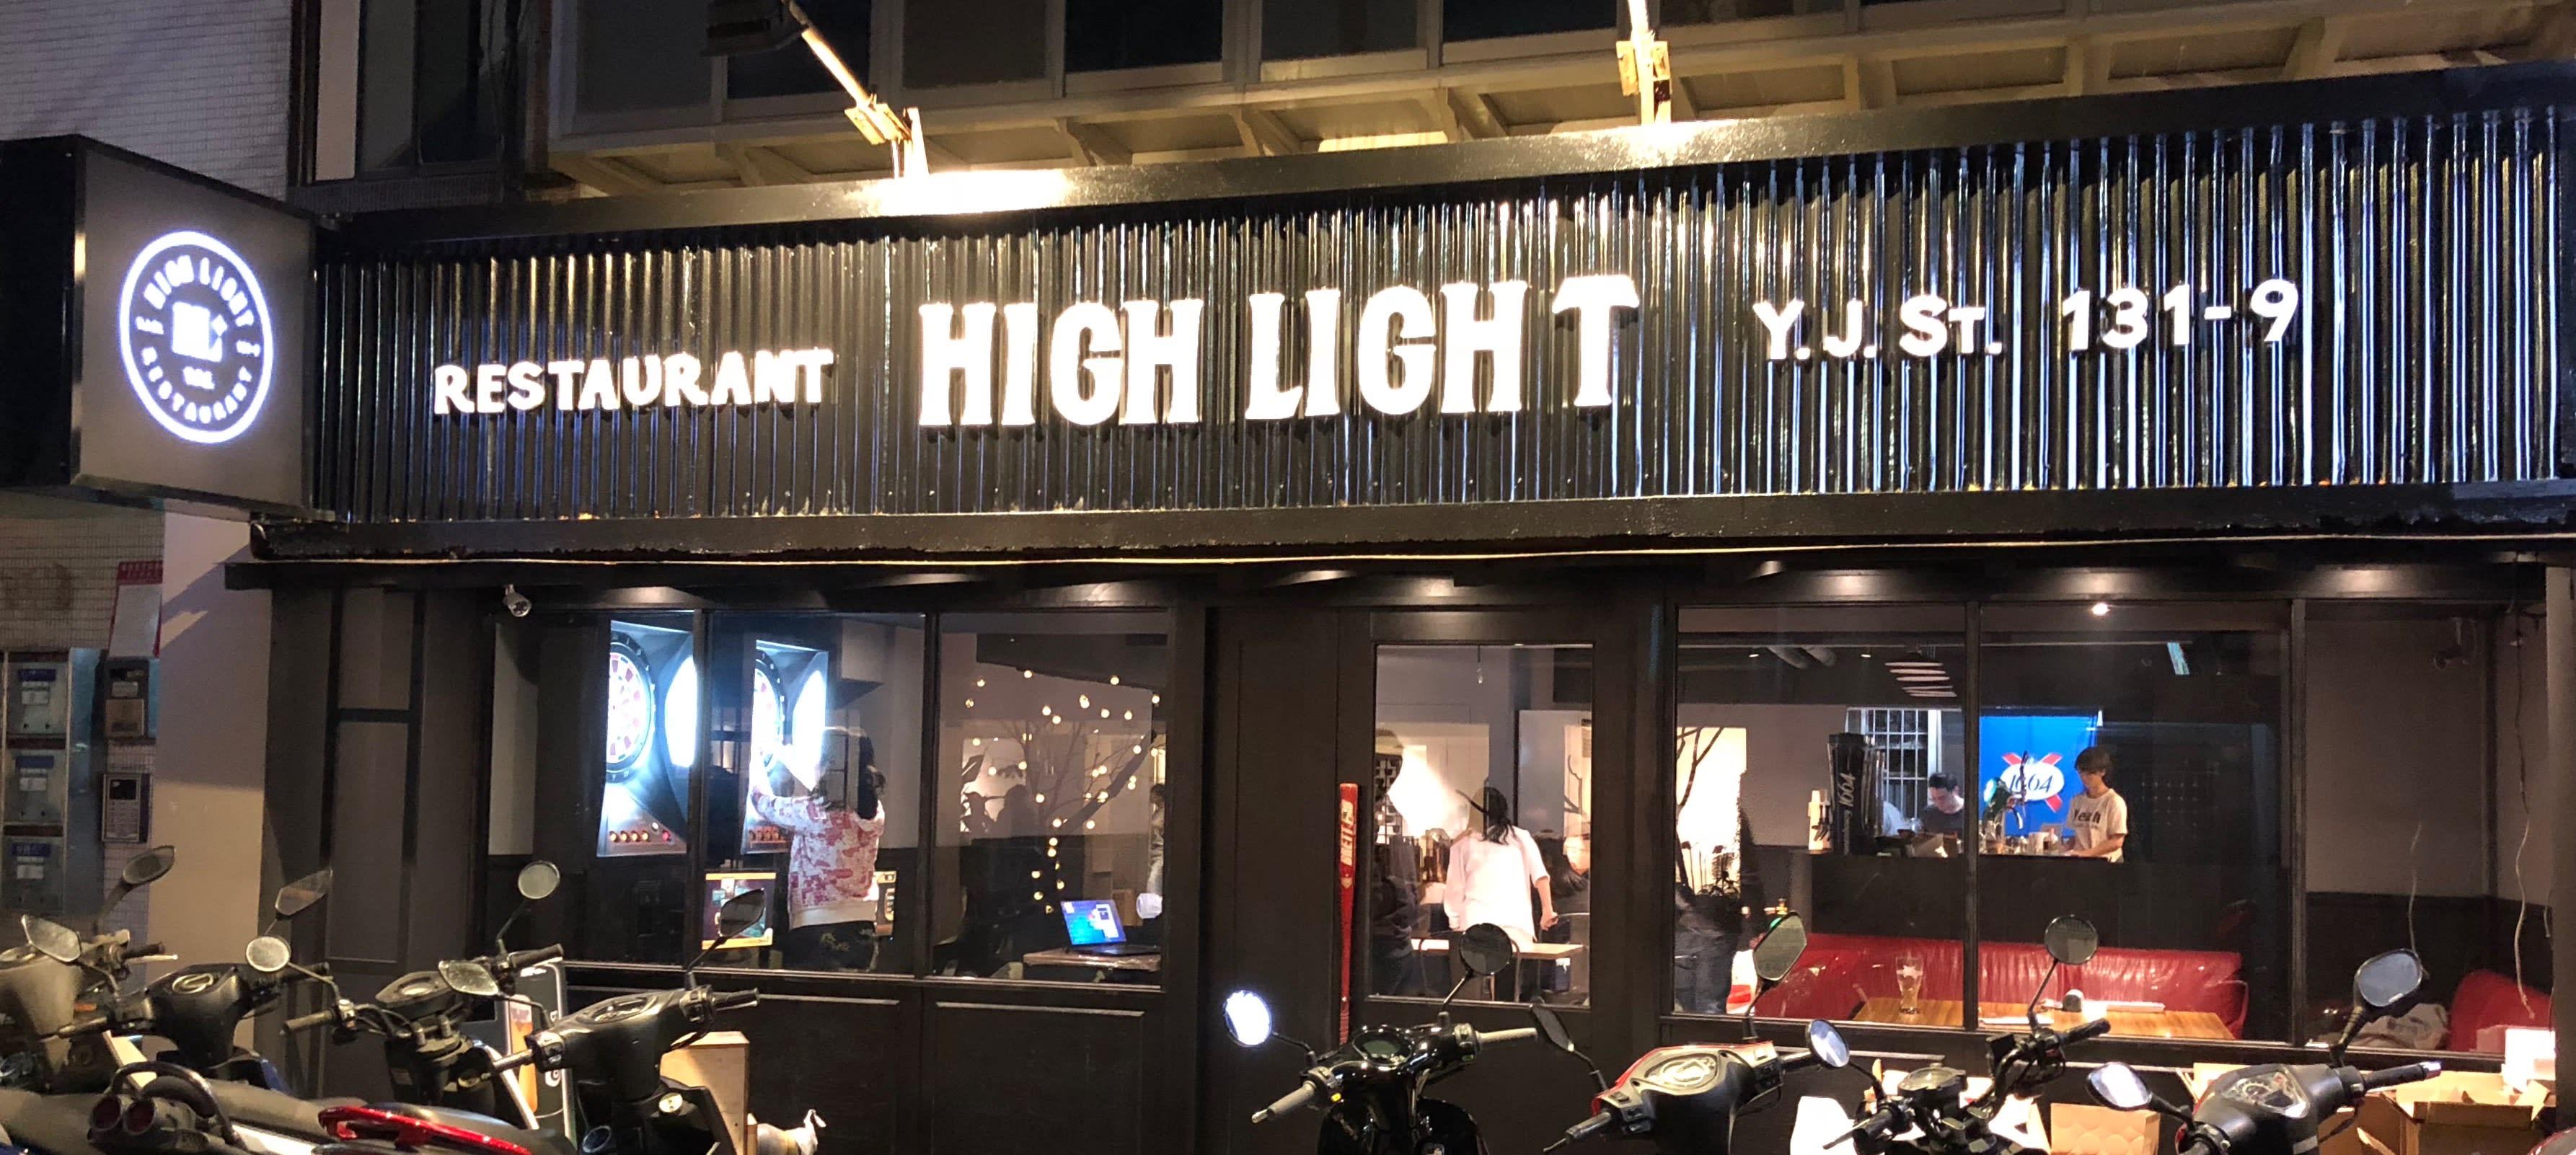 HighlightRestaurant